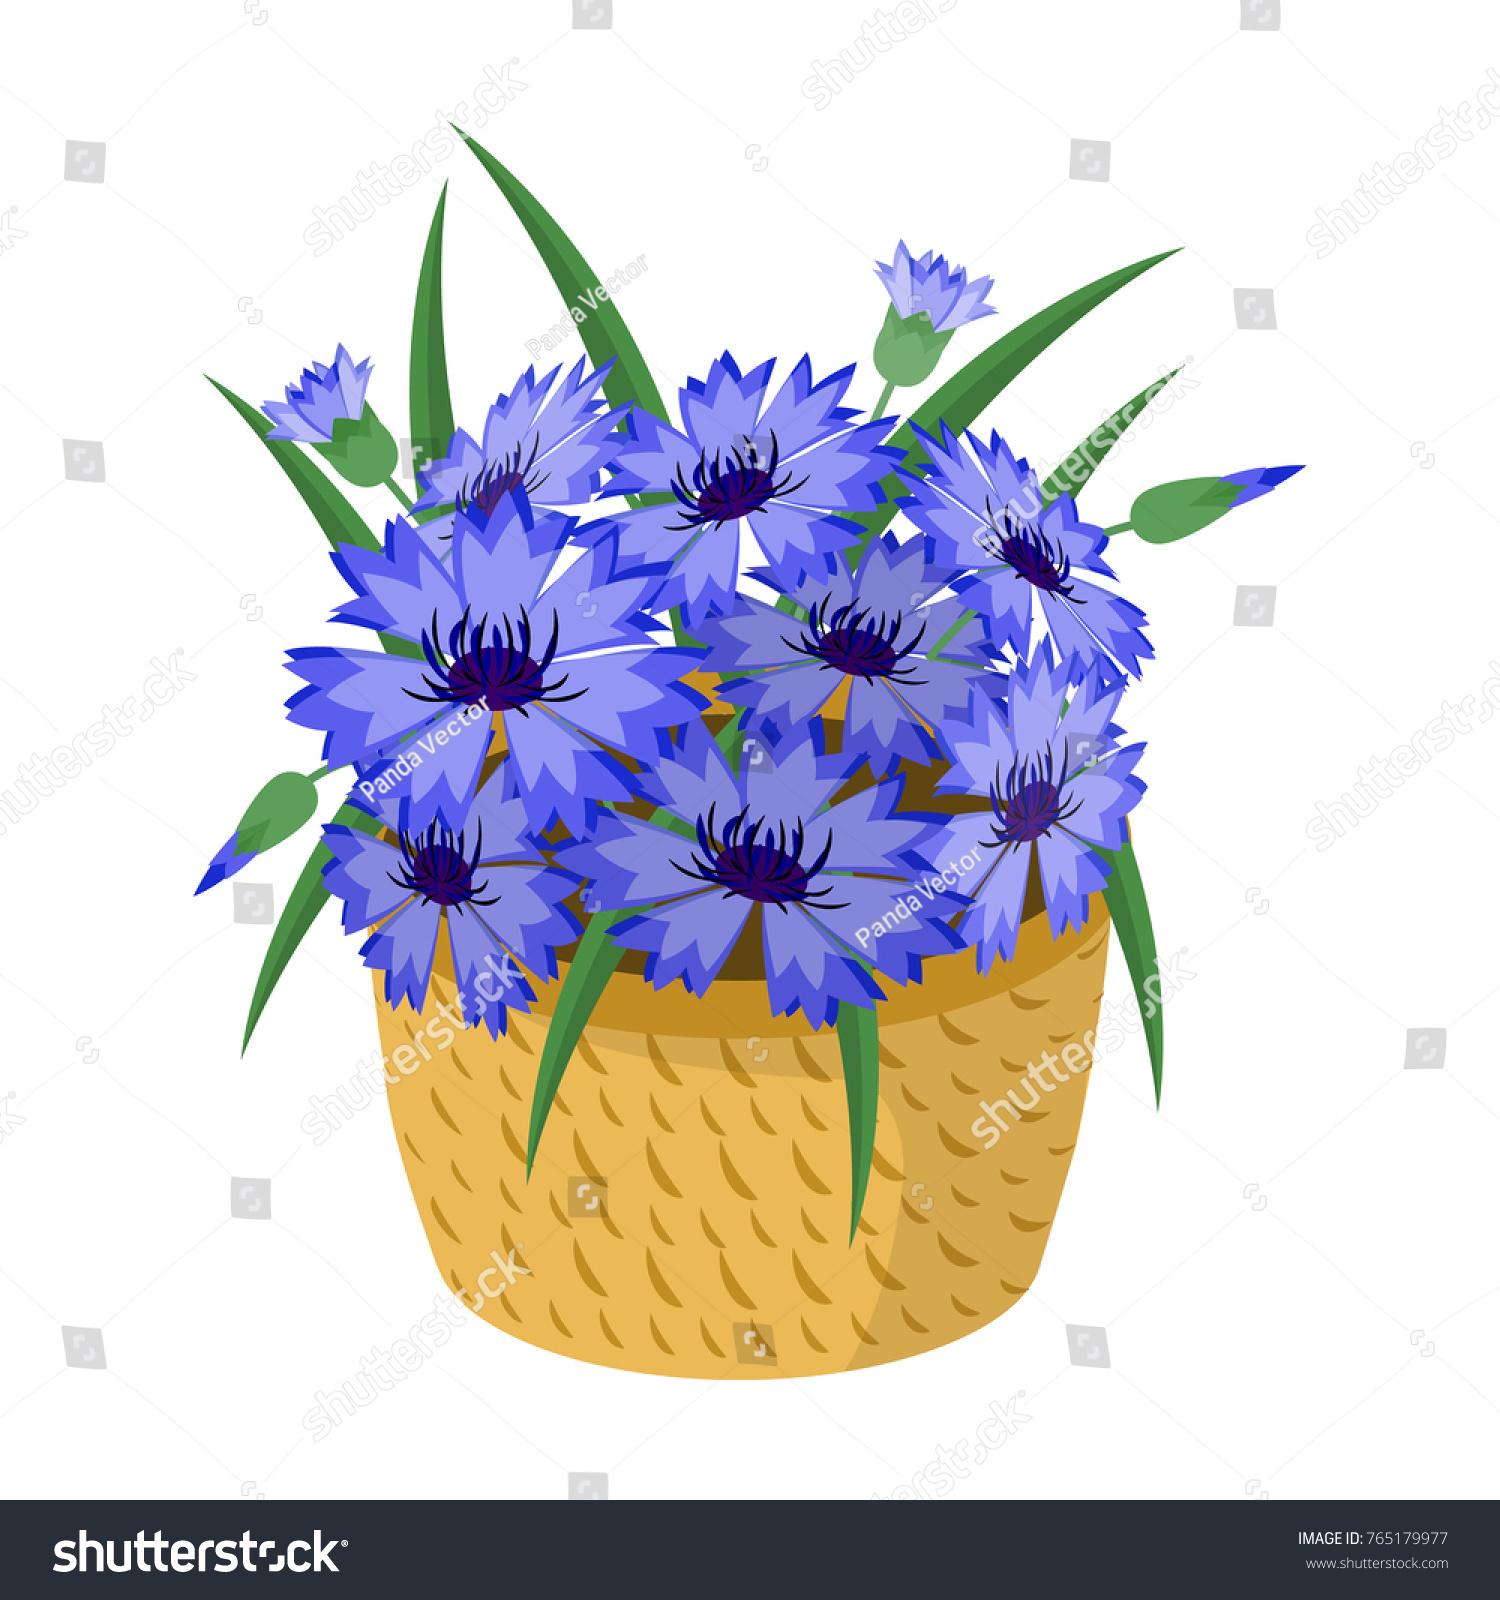 Bouquet fresh flowers single icon cartoon stock vector hd royalty a bouquet of fresh flowers single icon in cartoon style for design bouquet vector symbol izmirmasajfo Choice Image